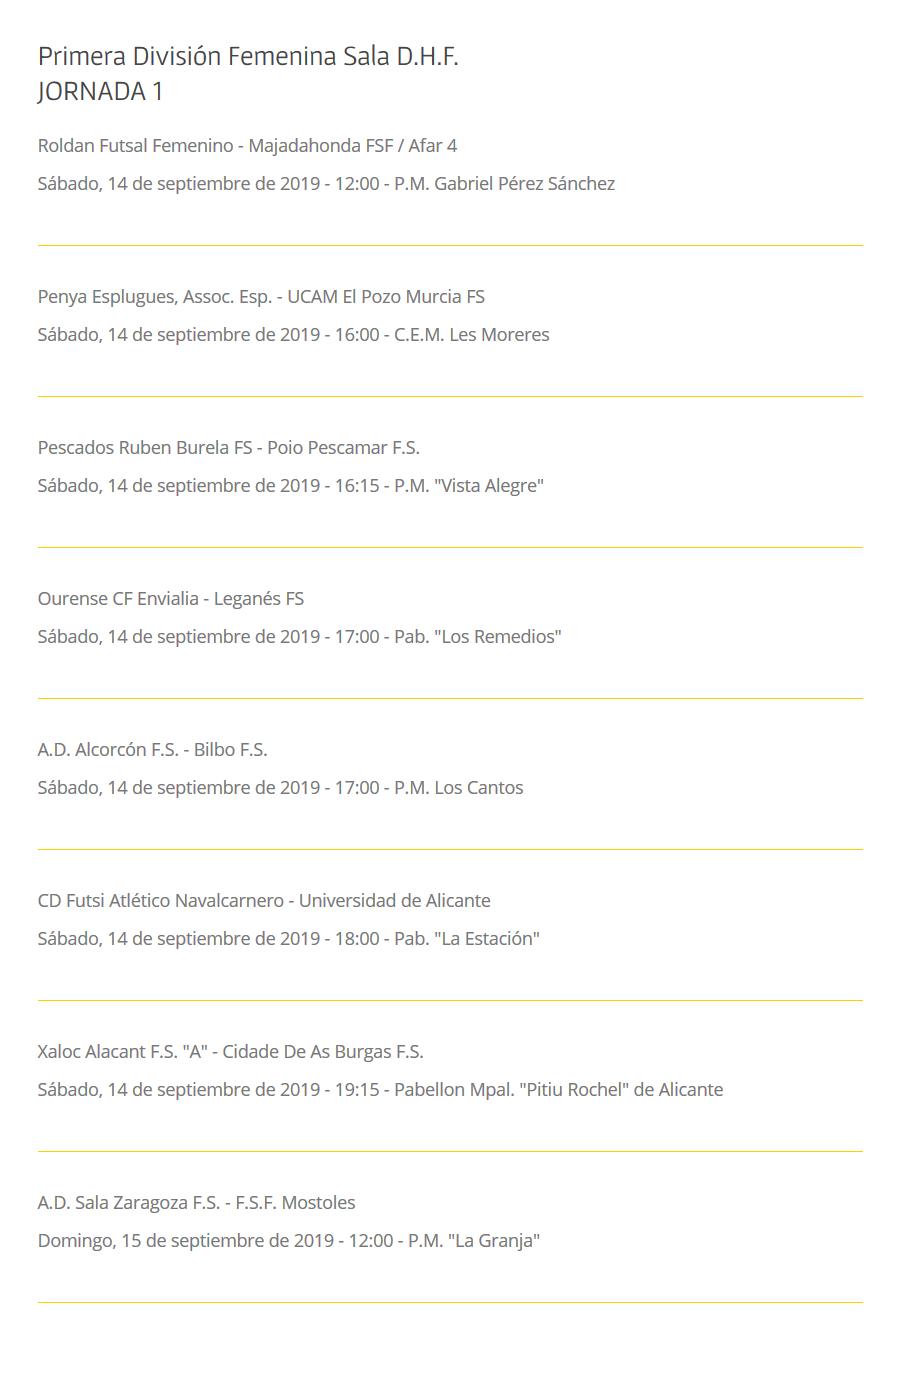 Horarios de Primera División Fútbol Sala Femenino. Temporada 19/20. Jornada 1